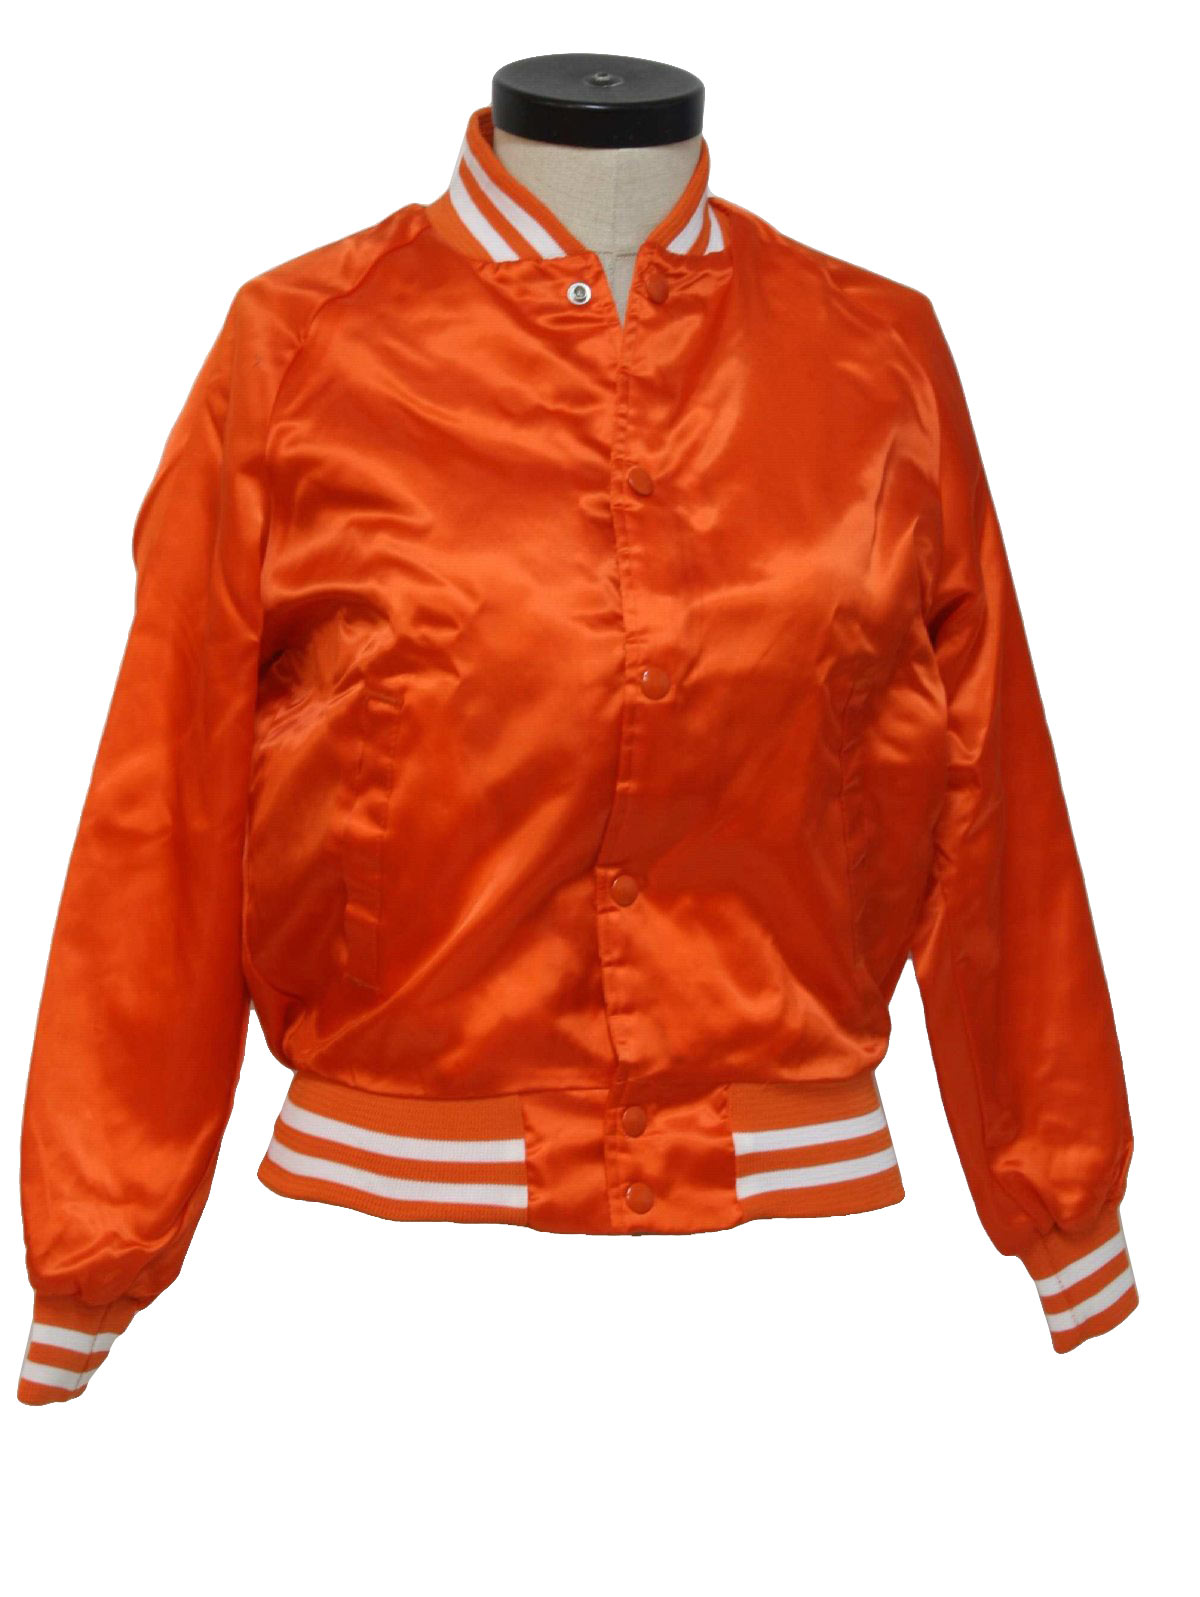 Orange Baseball Jacket j0uA0L